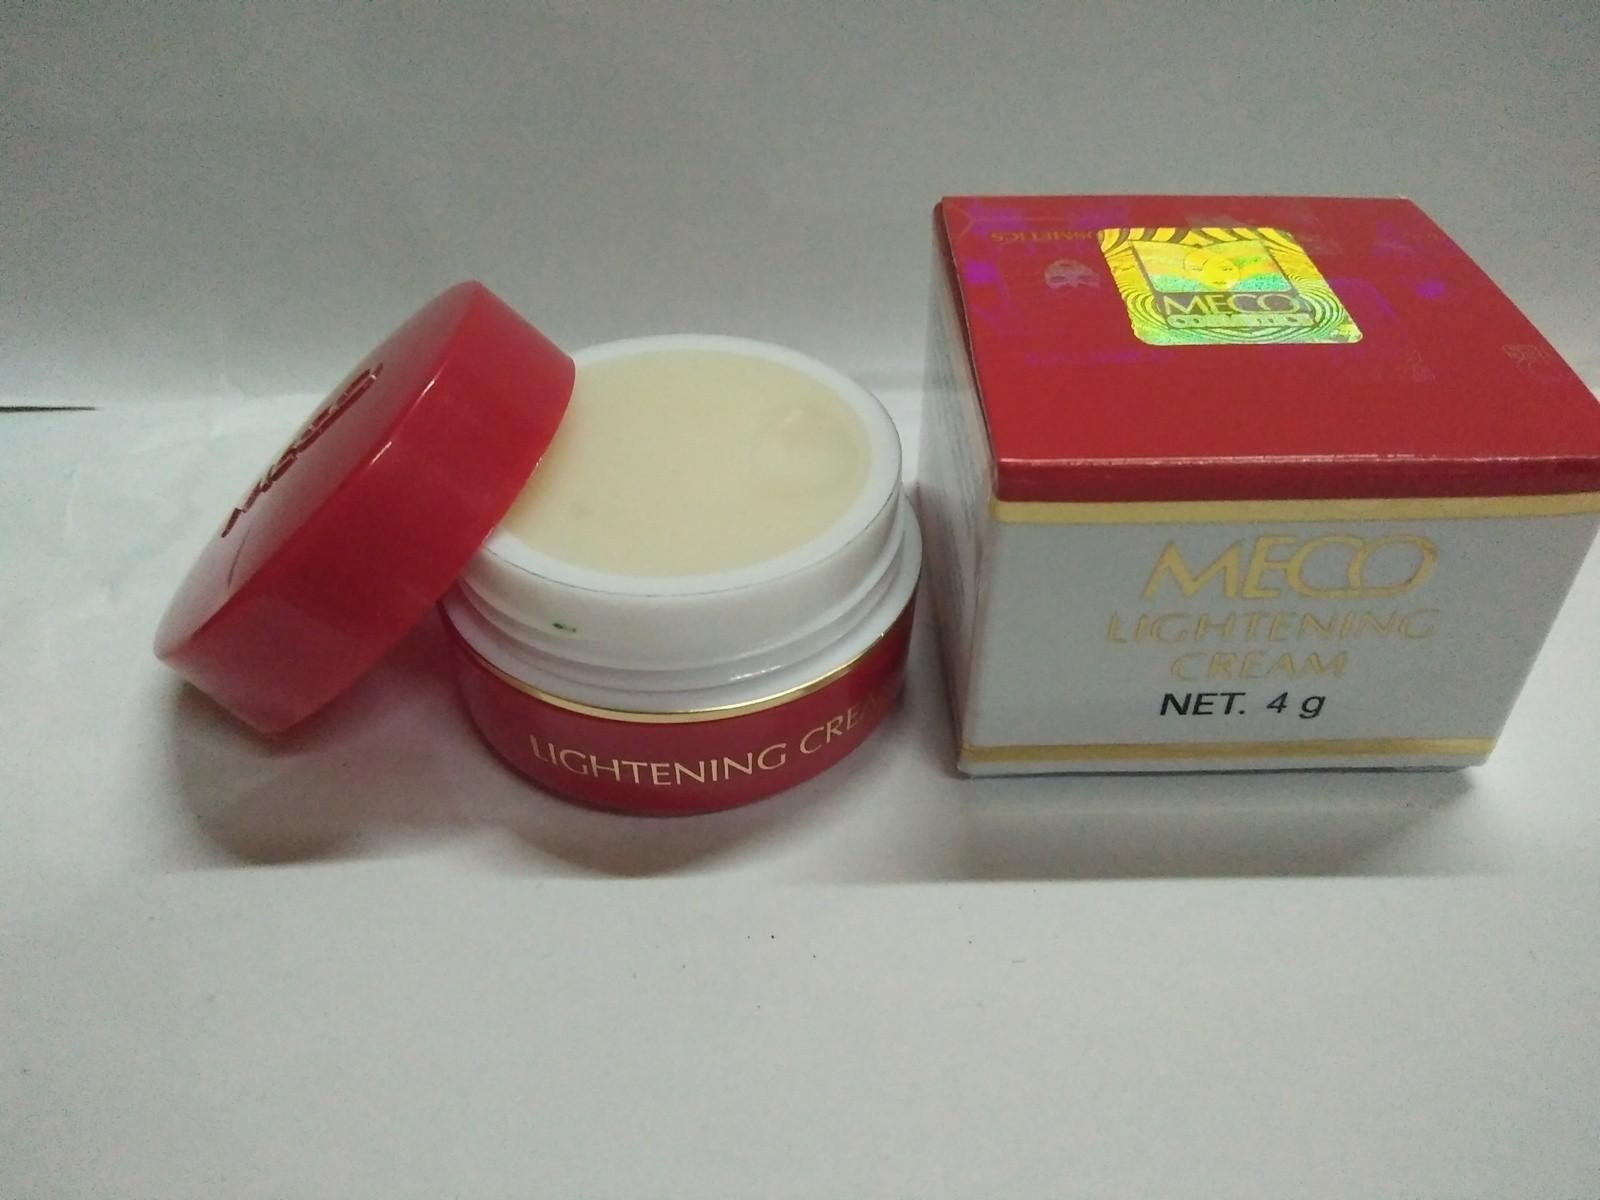 Bedak Chiumien Pearl Cream Collagen Plus Vit E Siang Dan Malam Vitamin Merupakan Produk Kecantikan Yang Dapat Digunakan Sebagai Alas Pelindung Dari Sinar